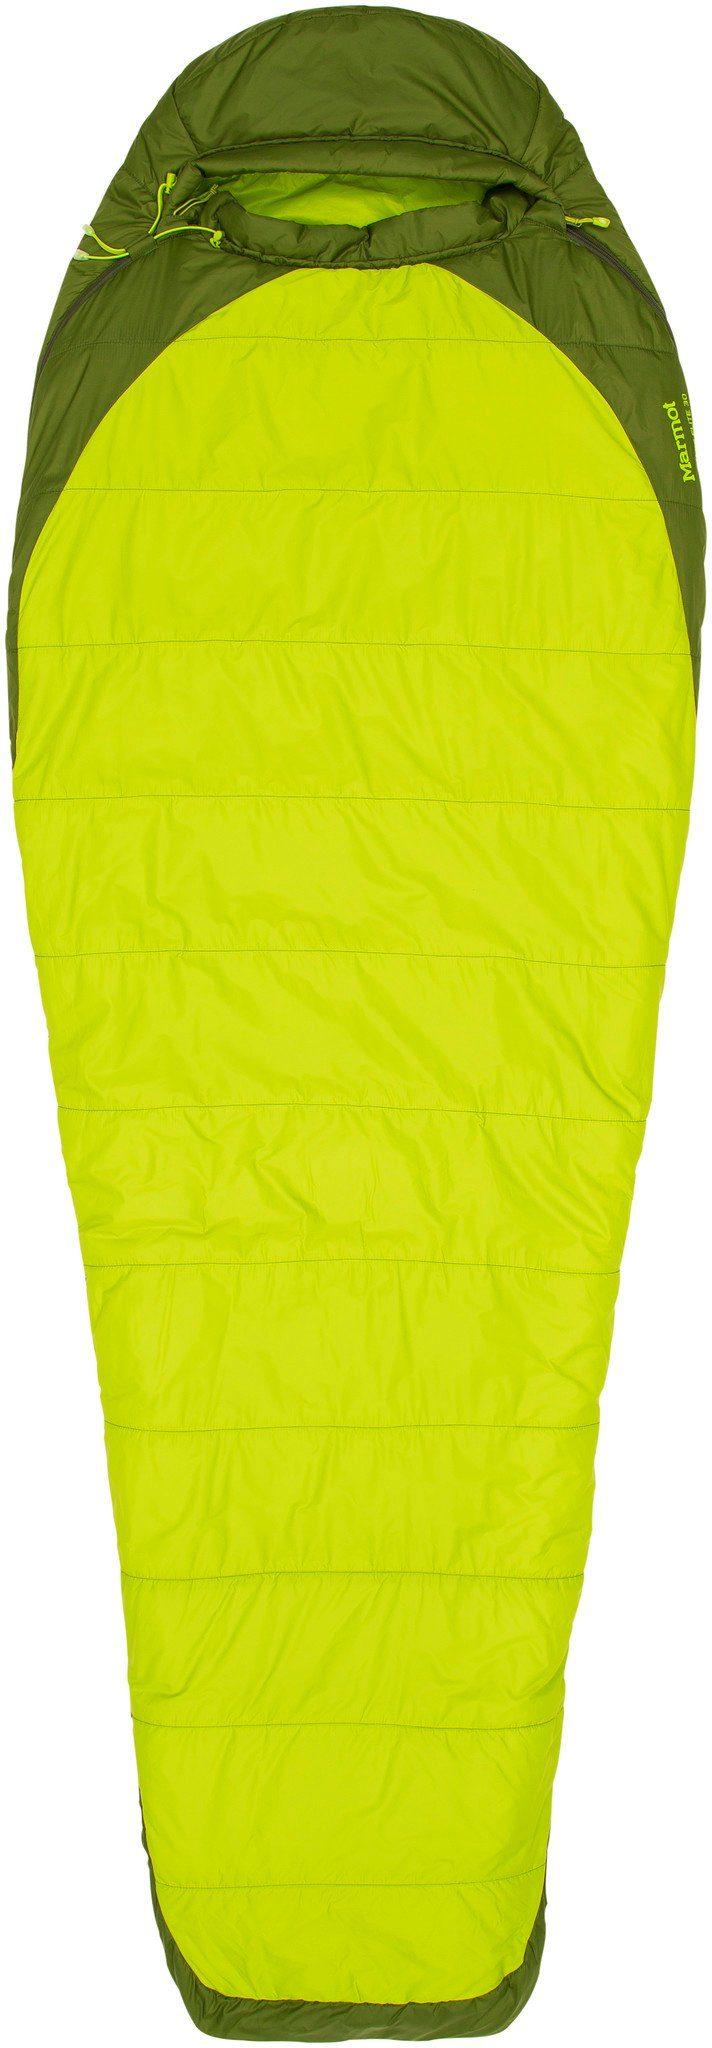 Marmot Wanderrucksack »Trestles Elite 30 Sleeping Bag Regular«